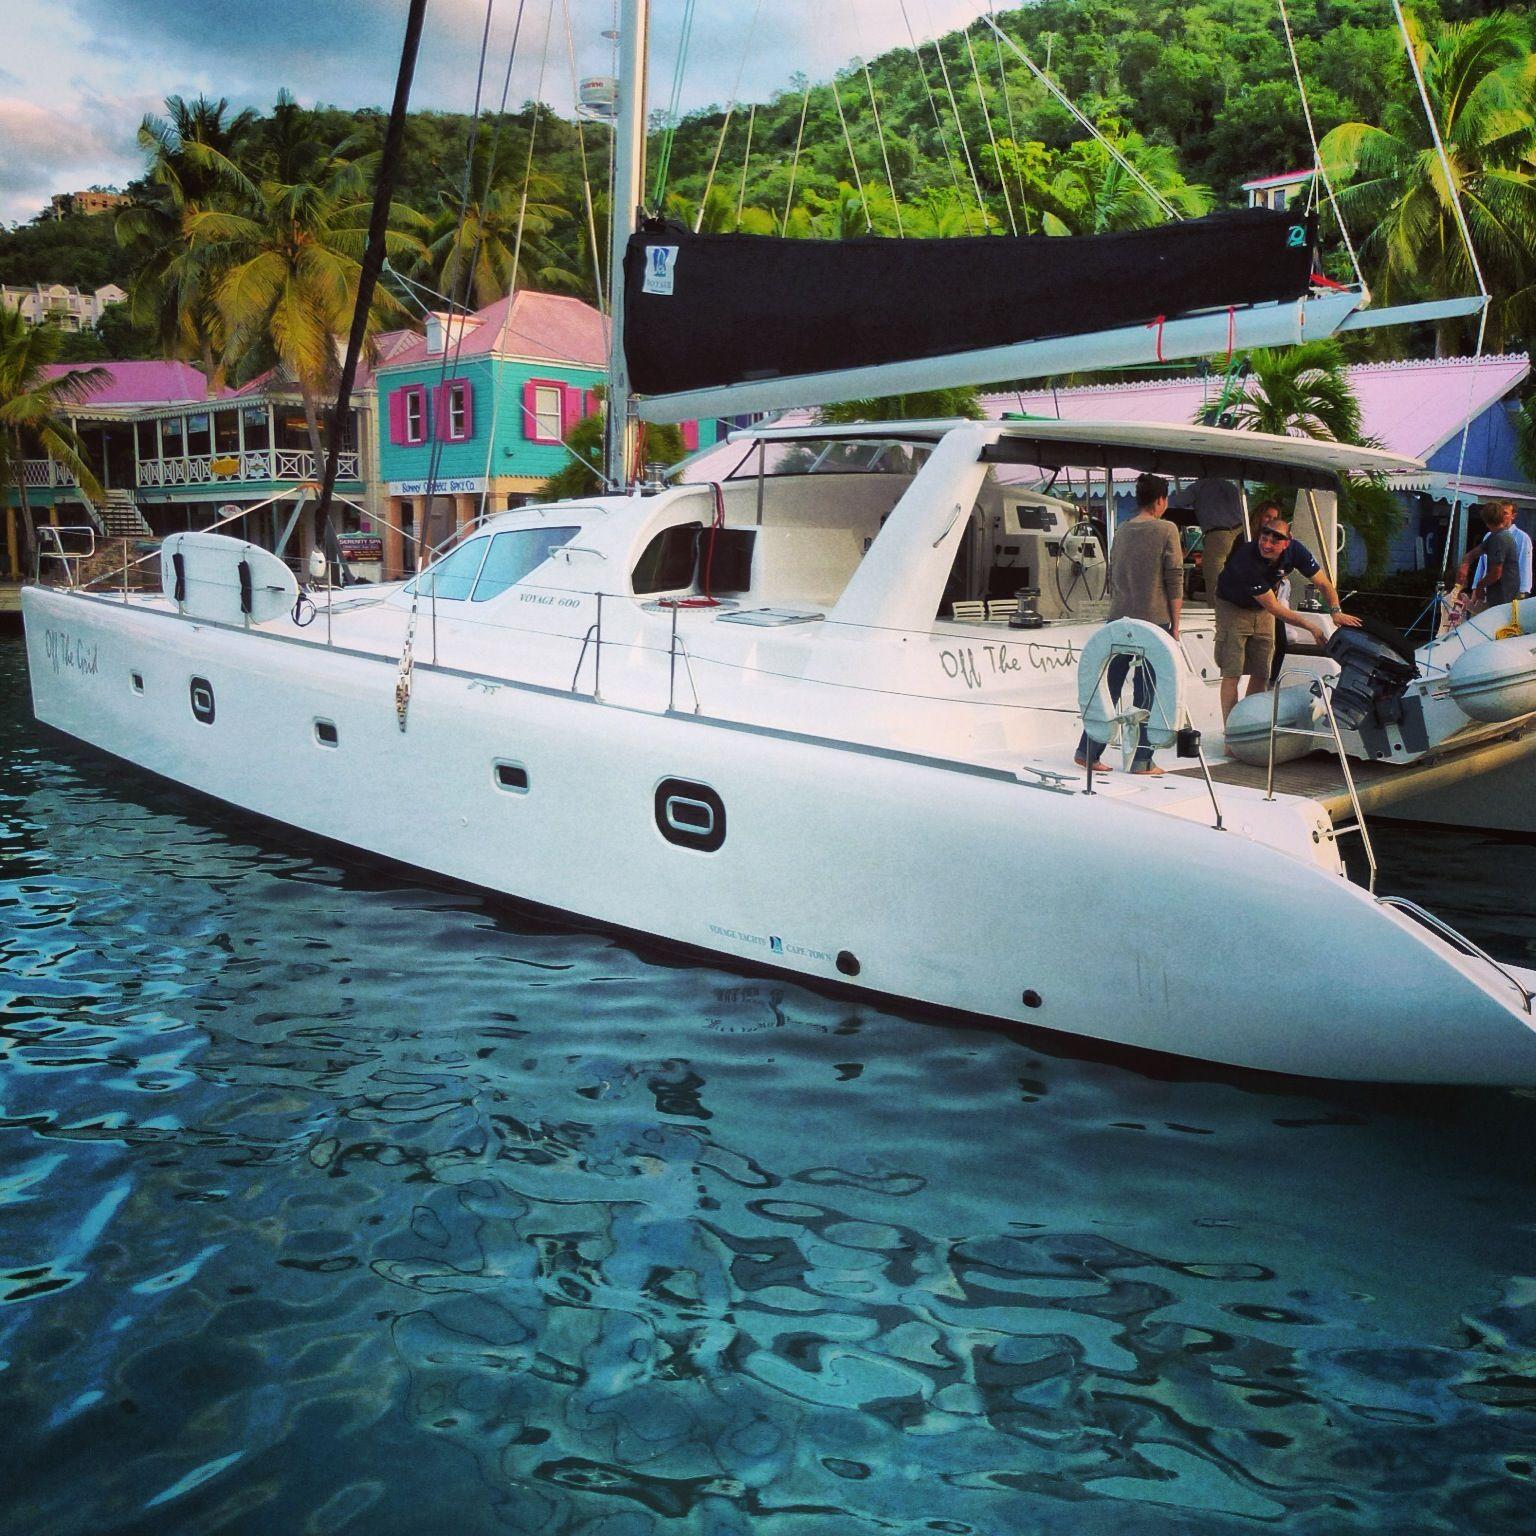 Catamaran Virgin Islands Vacation: The Biggest Bareboat. Period. The Voyage 600. 60 Feet Long